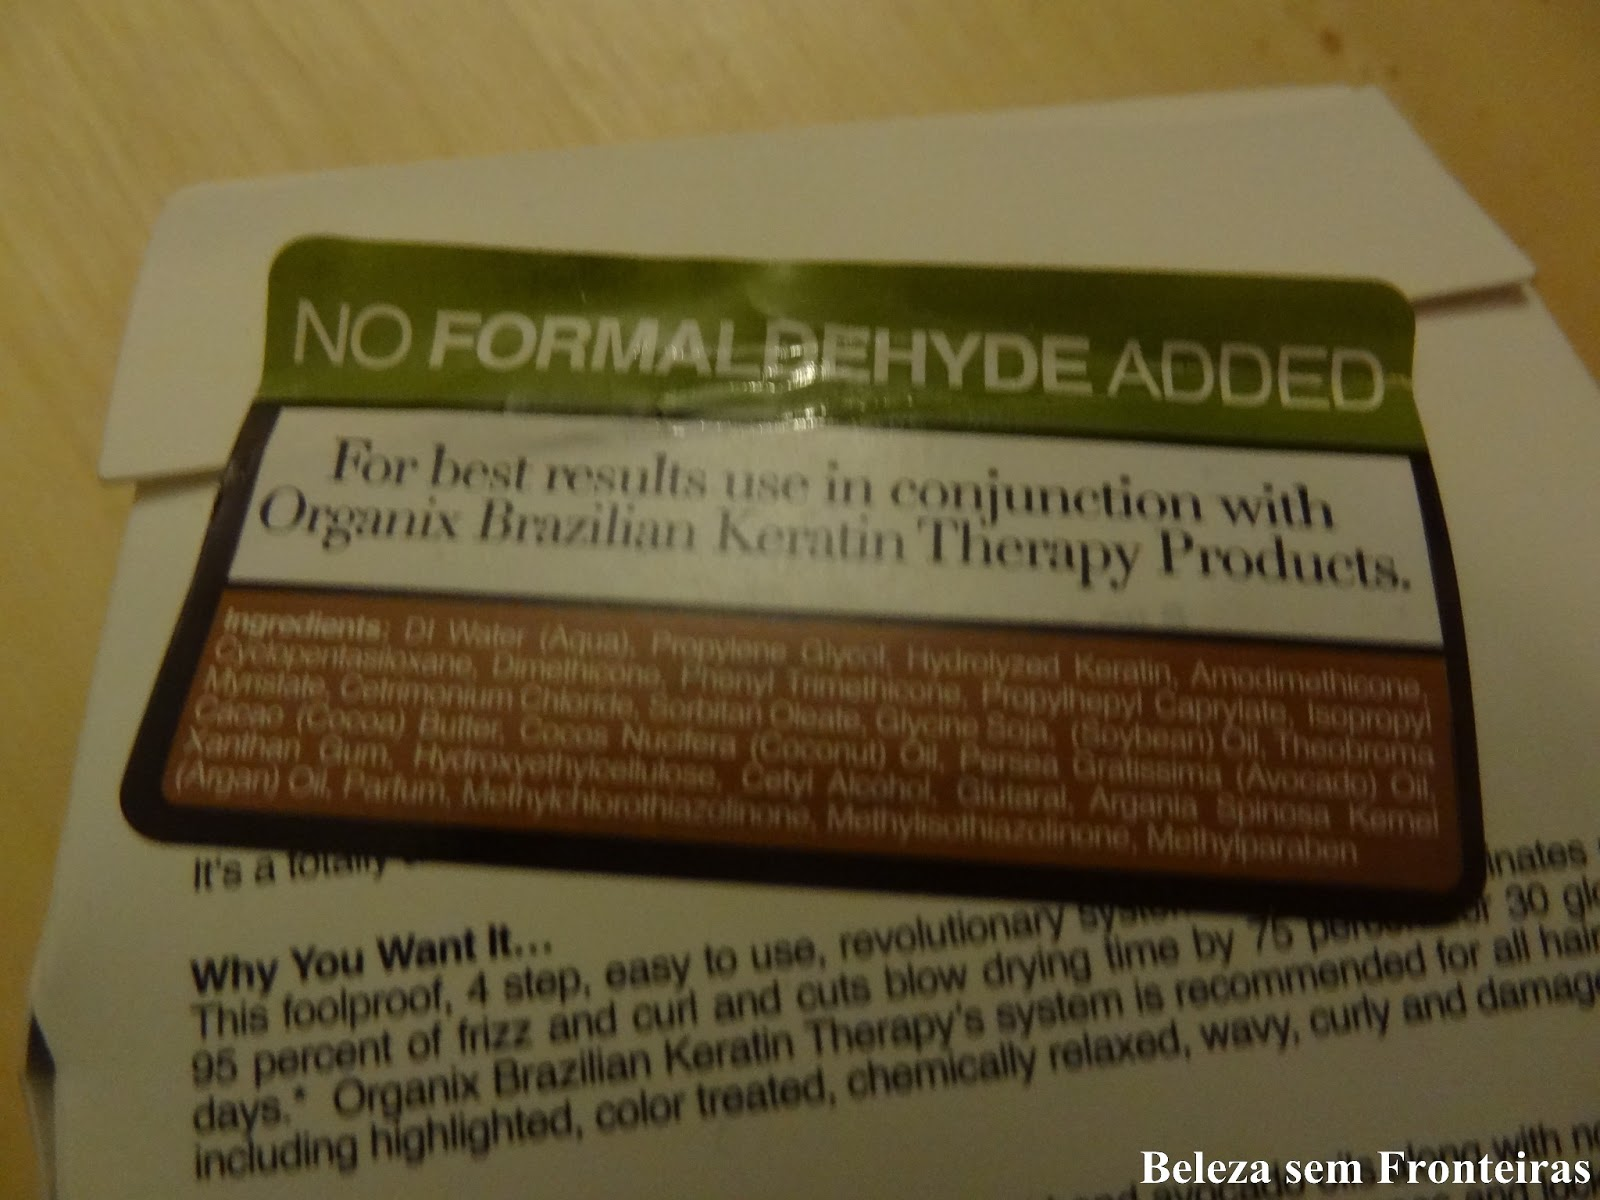 : Brazilian Keratin Therapy Smoothing Treatment 30 days Organix